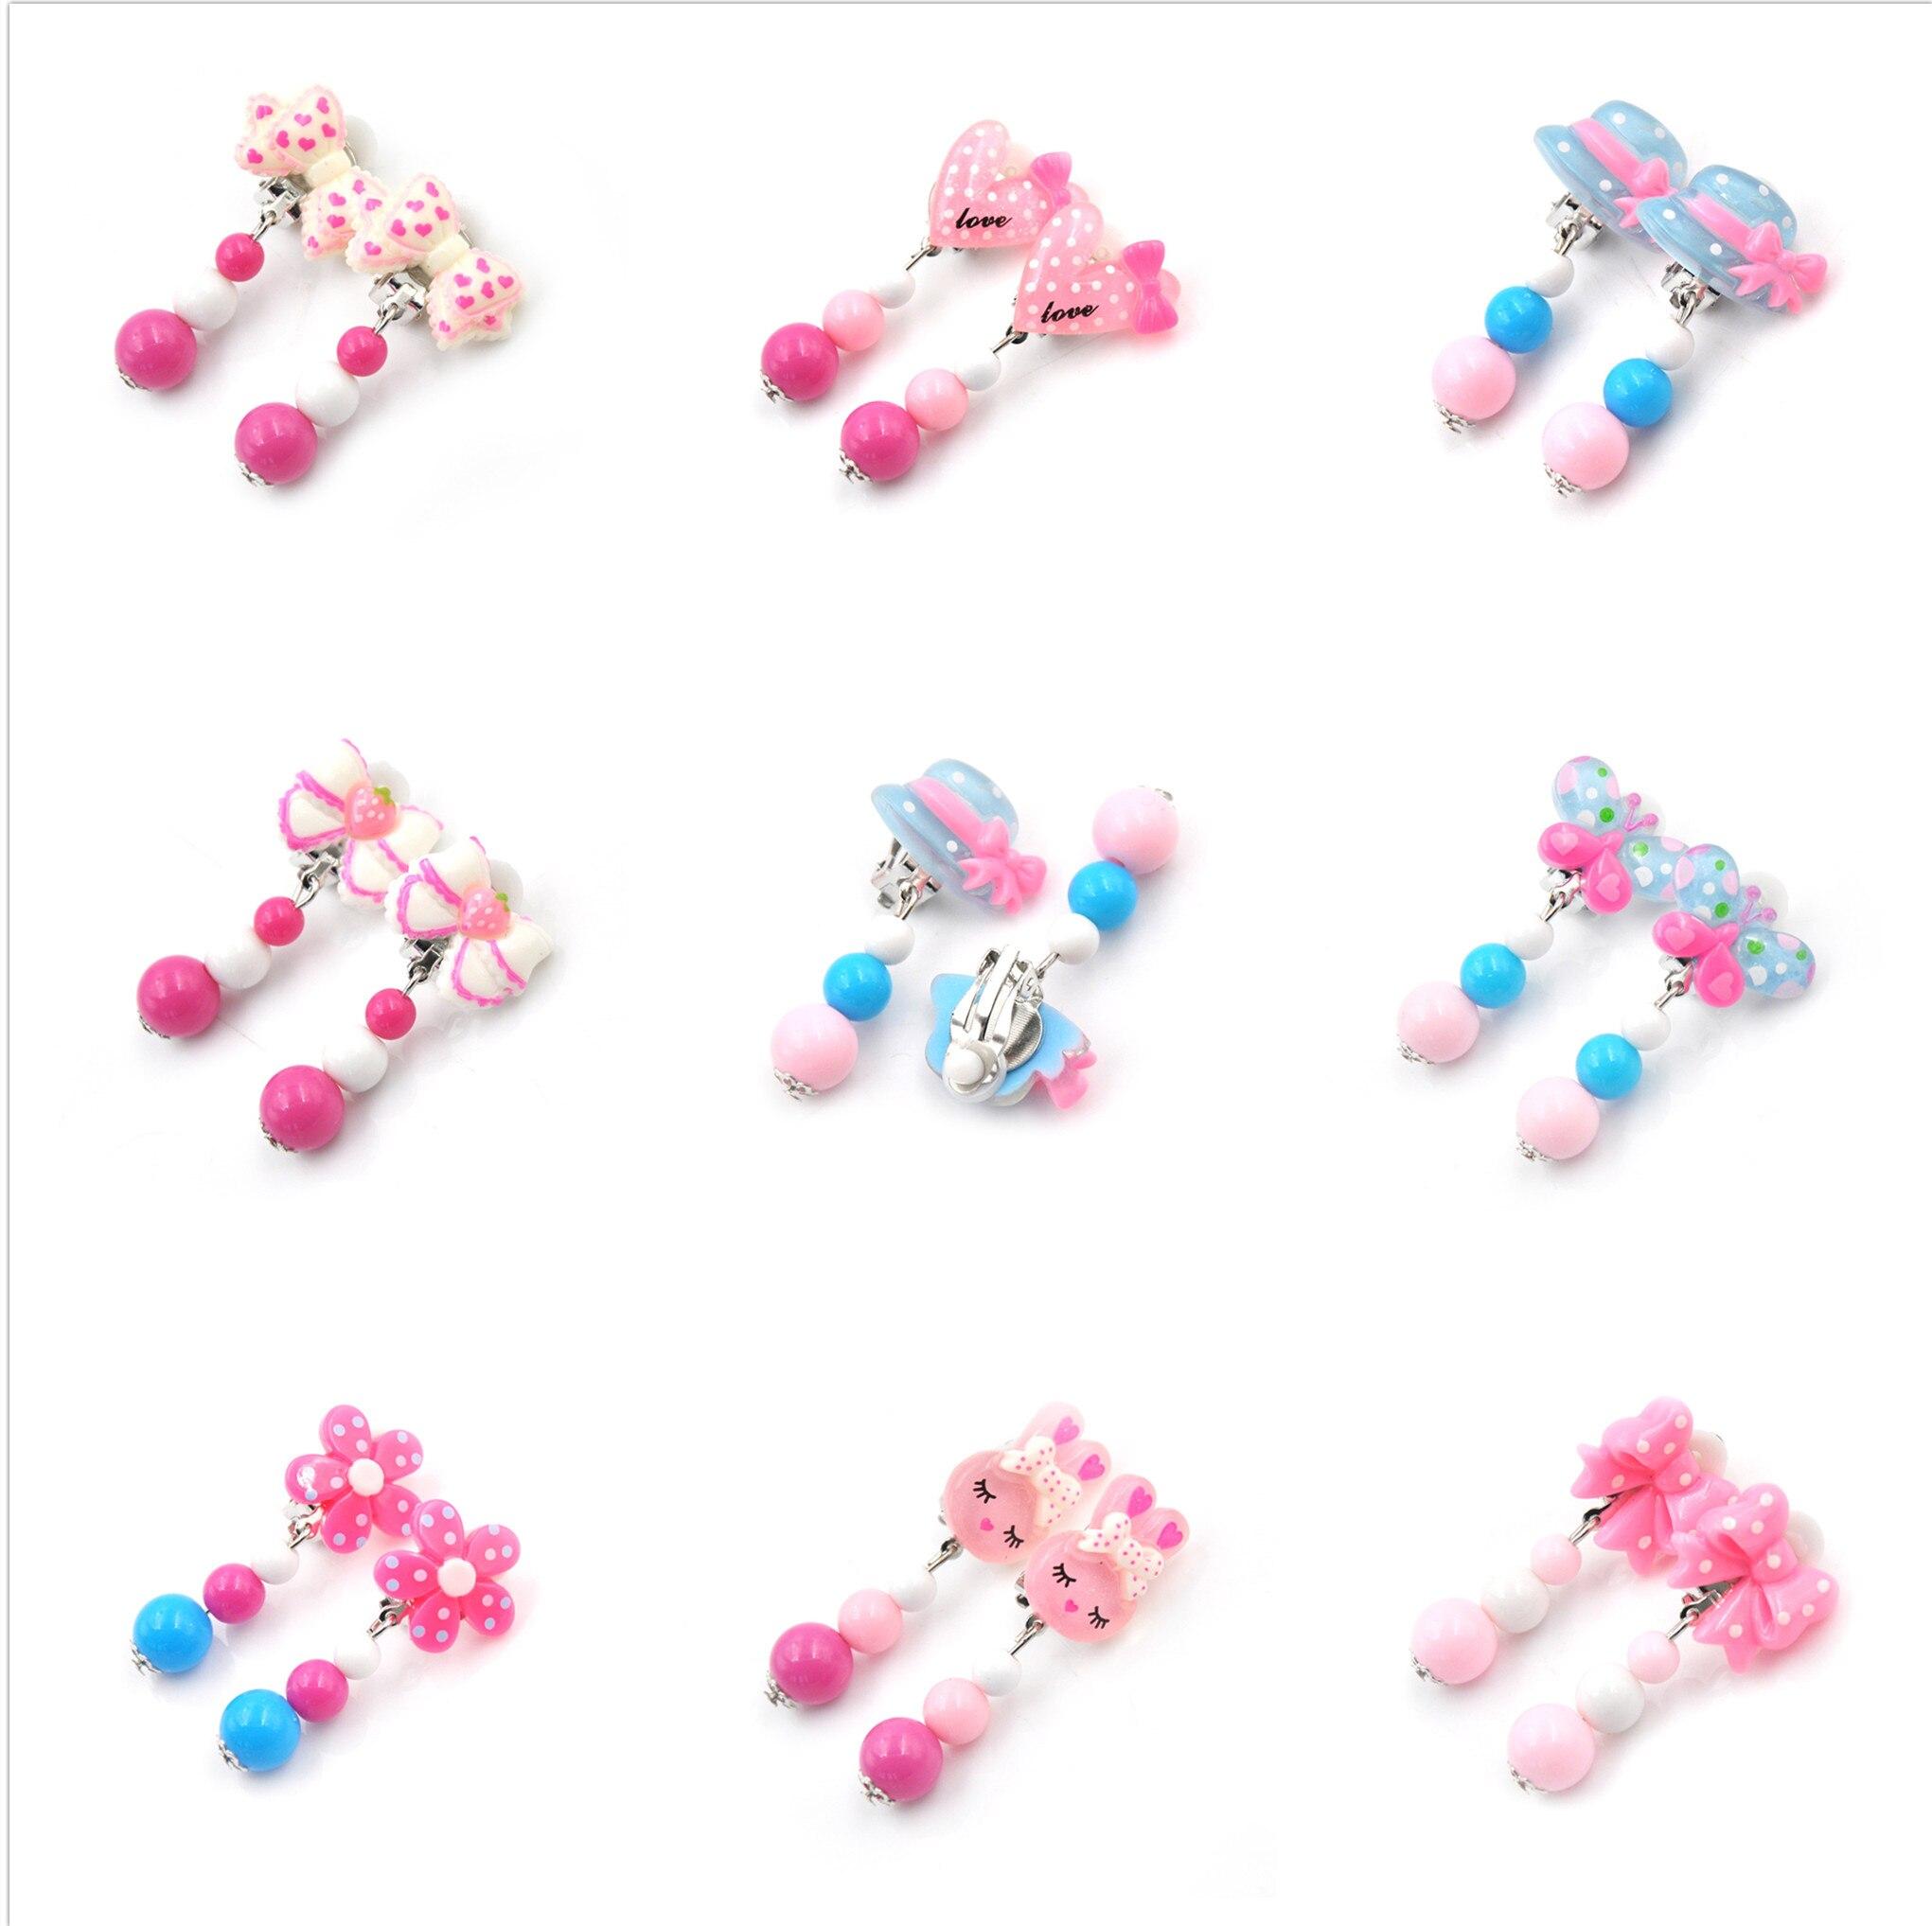 1Pair Mixed Styles Lot Ovely Cartoon Children Jewelry Baby Girl Earrings Kids Ear Clip On Pierced Alloy Painless Earrings